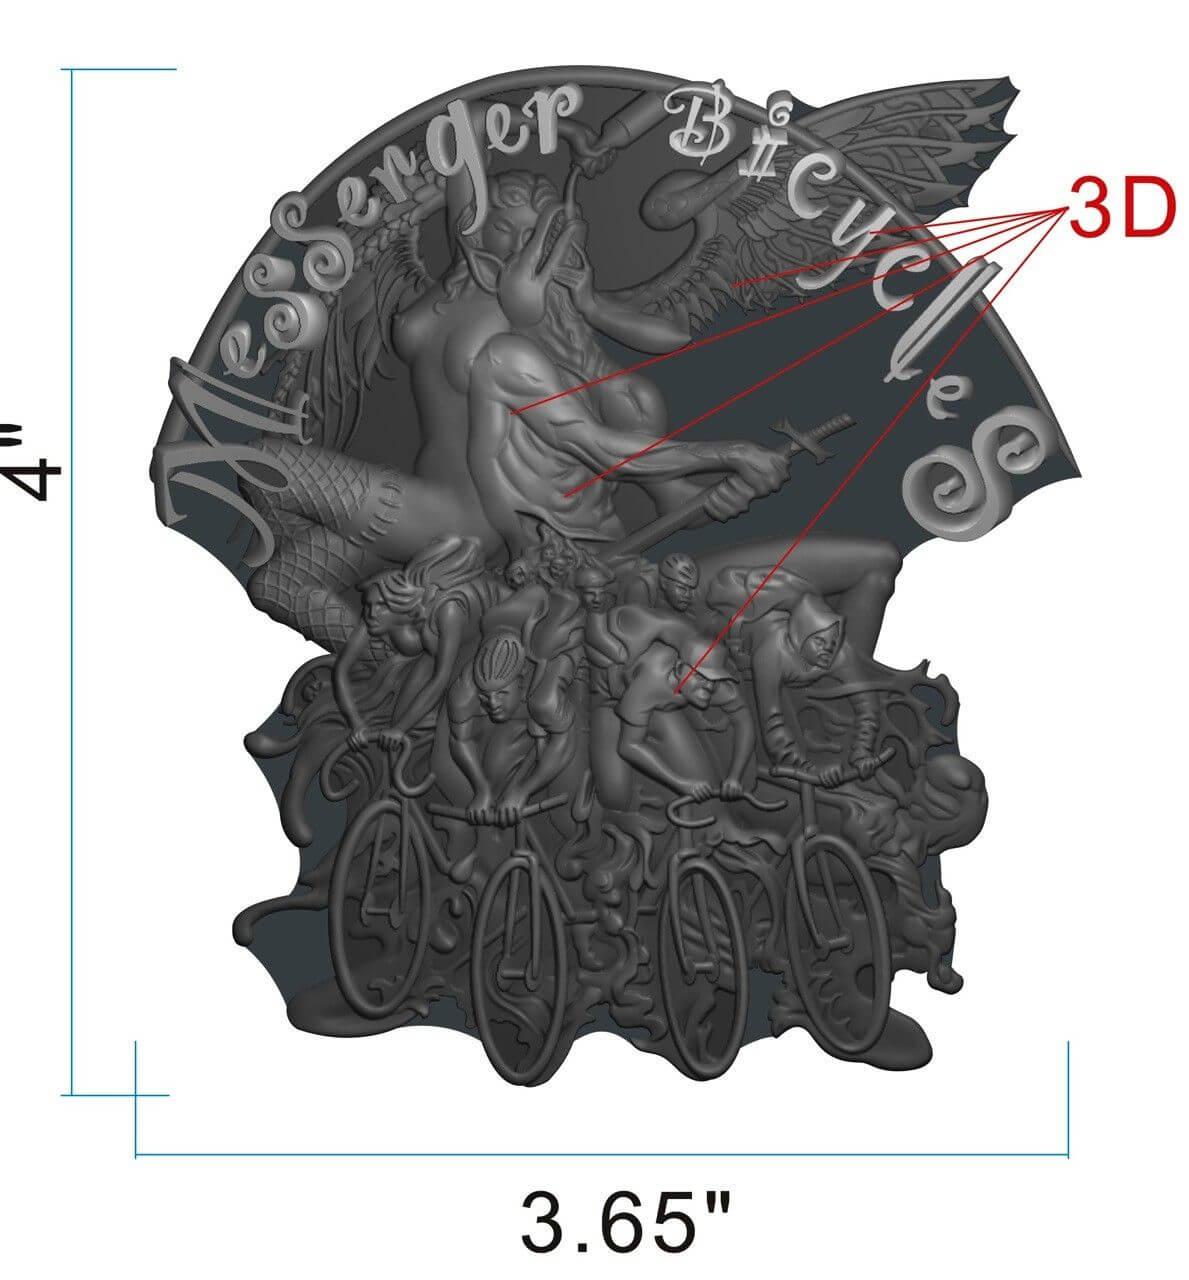 3D Head Badge